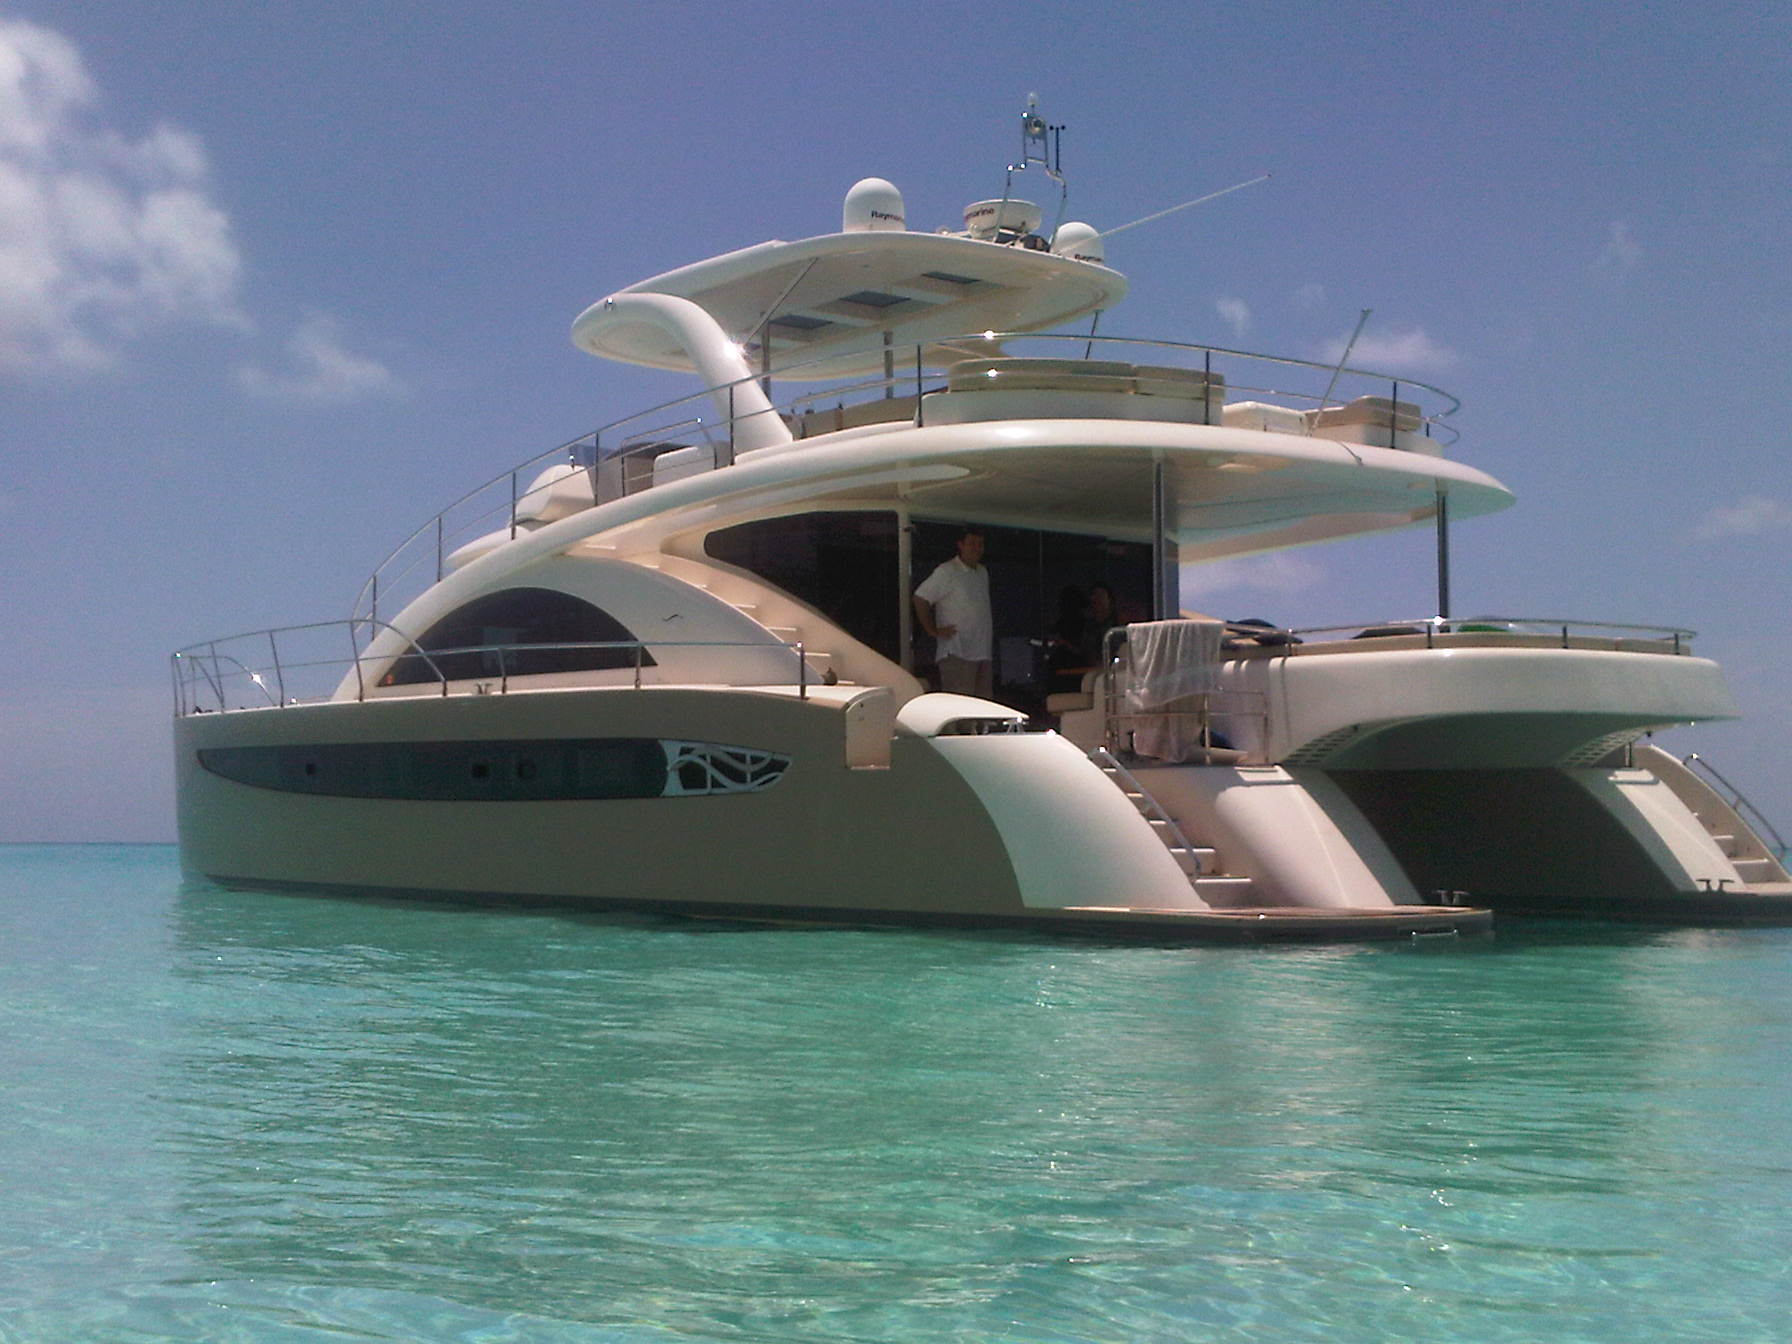 62ft Power Cat Yacht